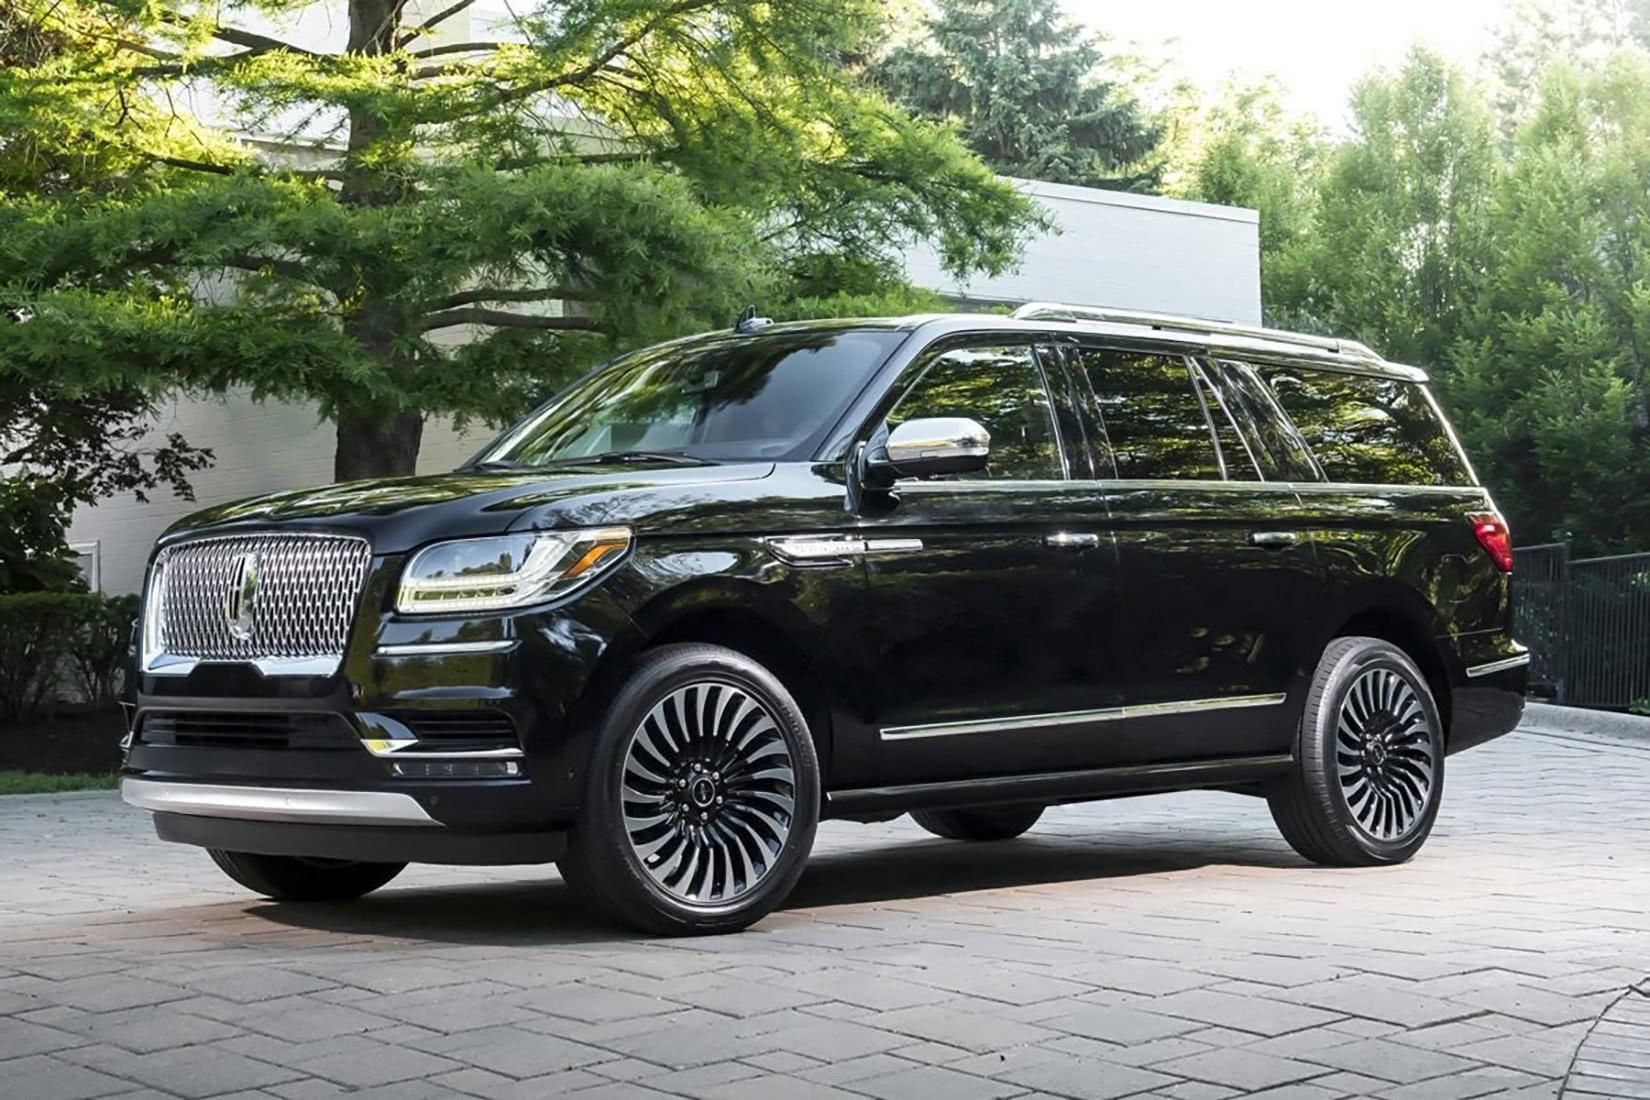 best luxury suv 2021 Lincoln Navigator L - Luxe Digital